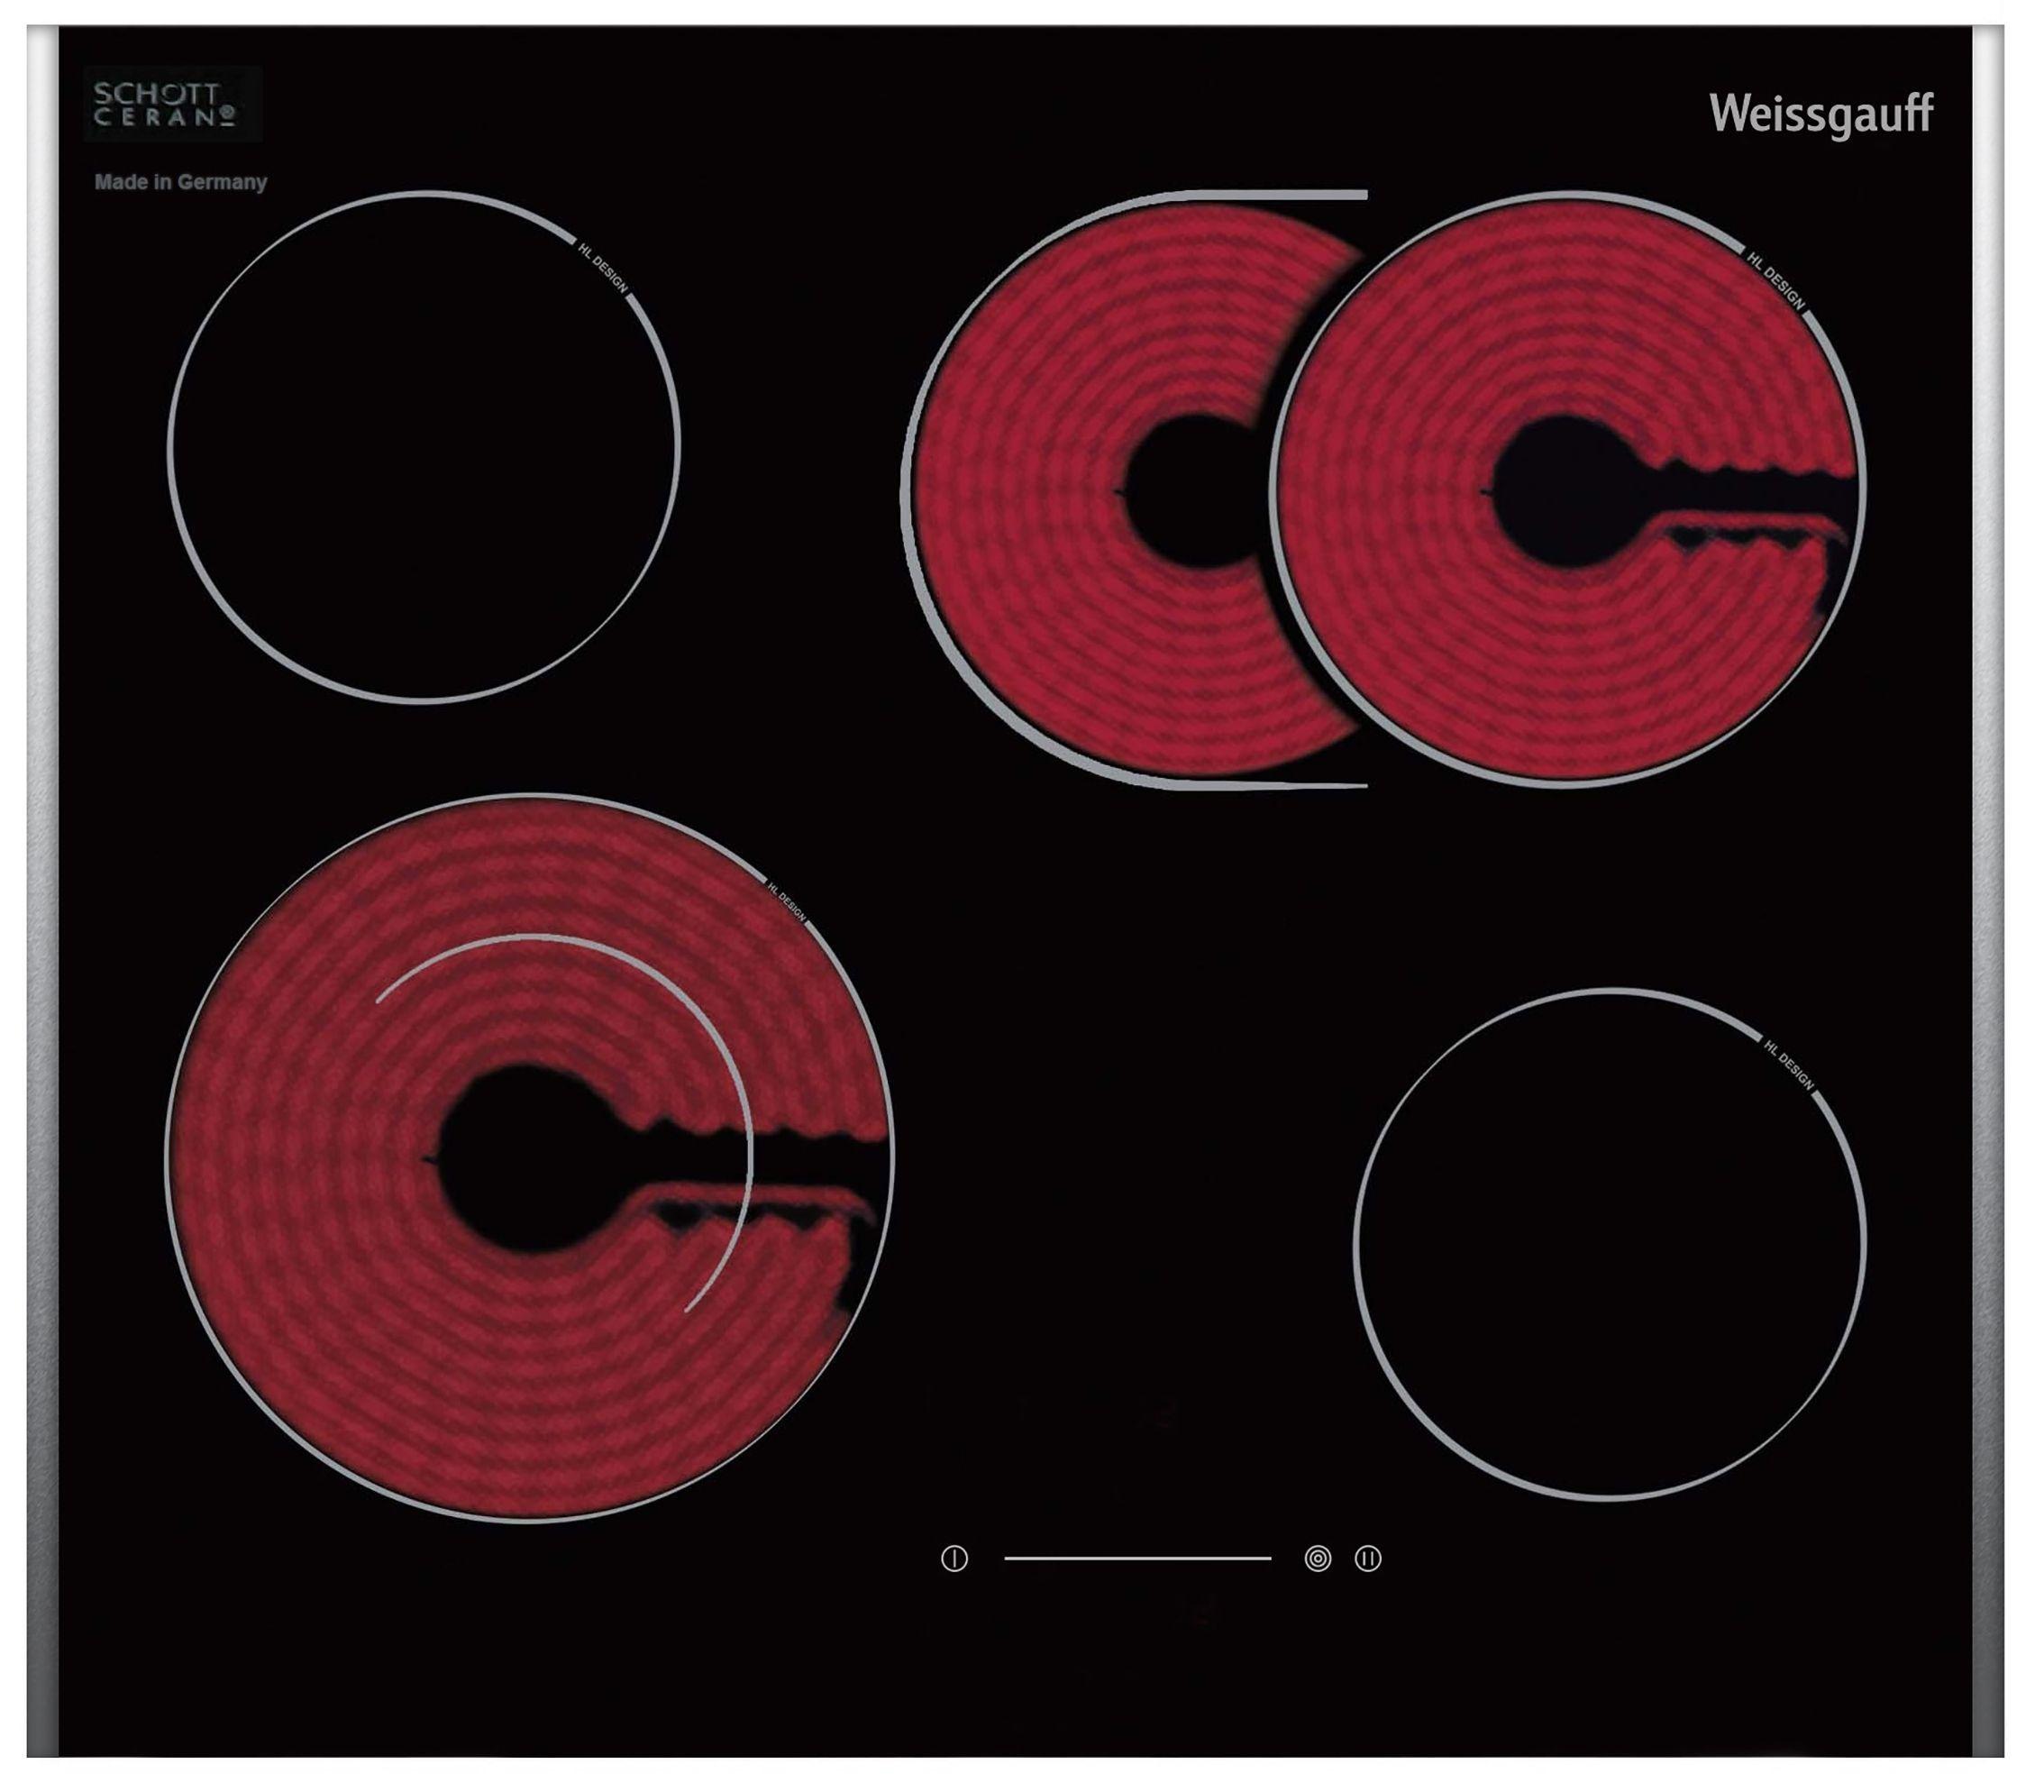 Стеклокерамическая панель Weissgauff HVB 675 B